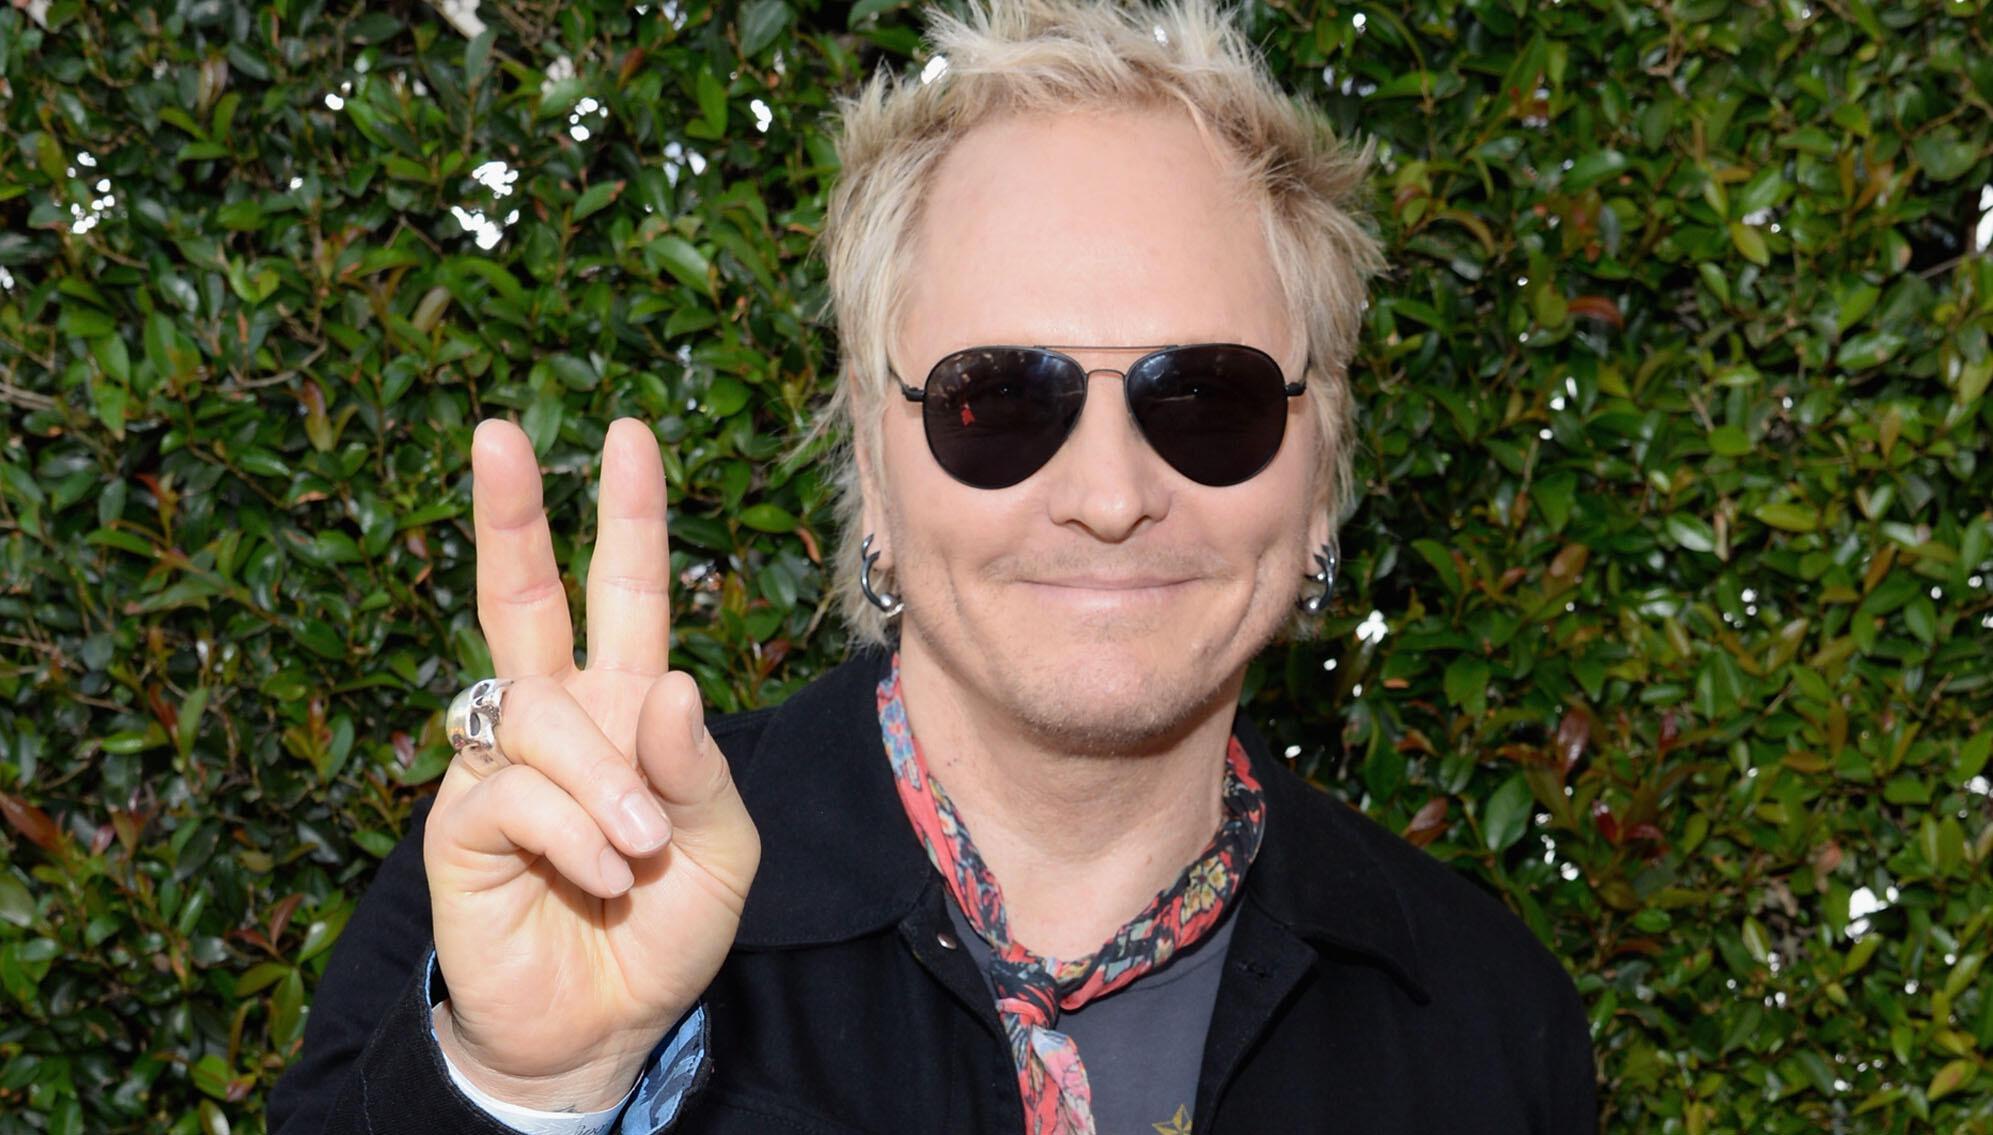 Ex-Guns N' Roses' Drummer Matt Sorum Announces Memoir Release Date